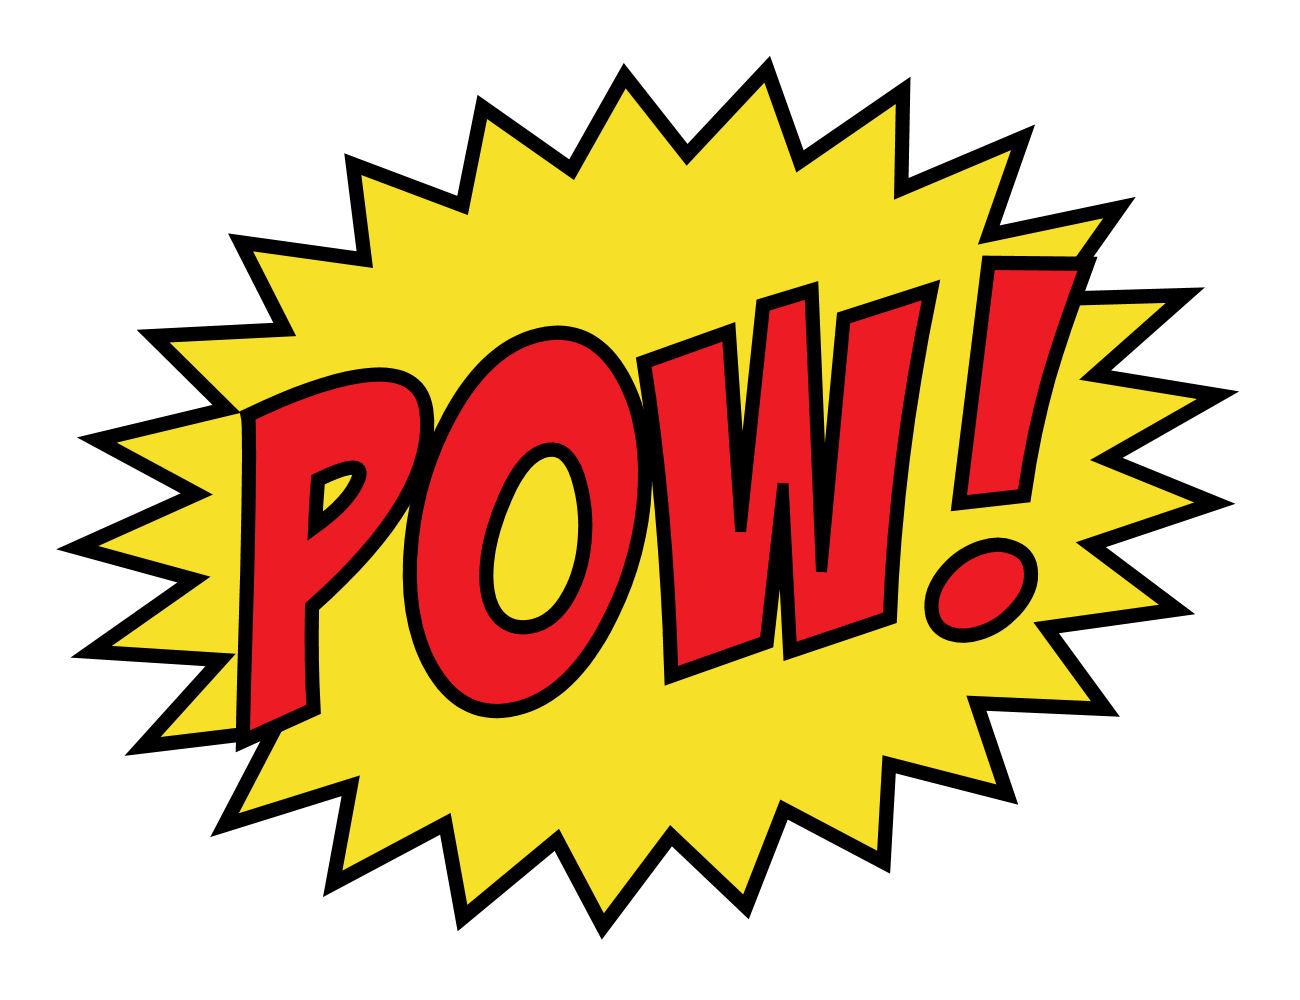 Super Hero Words Clipart-Super Hero Words Clipart-7